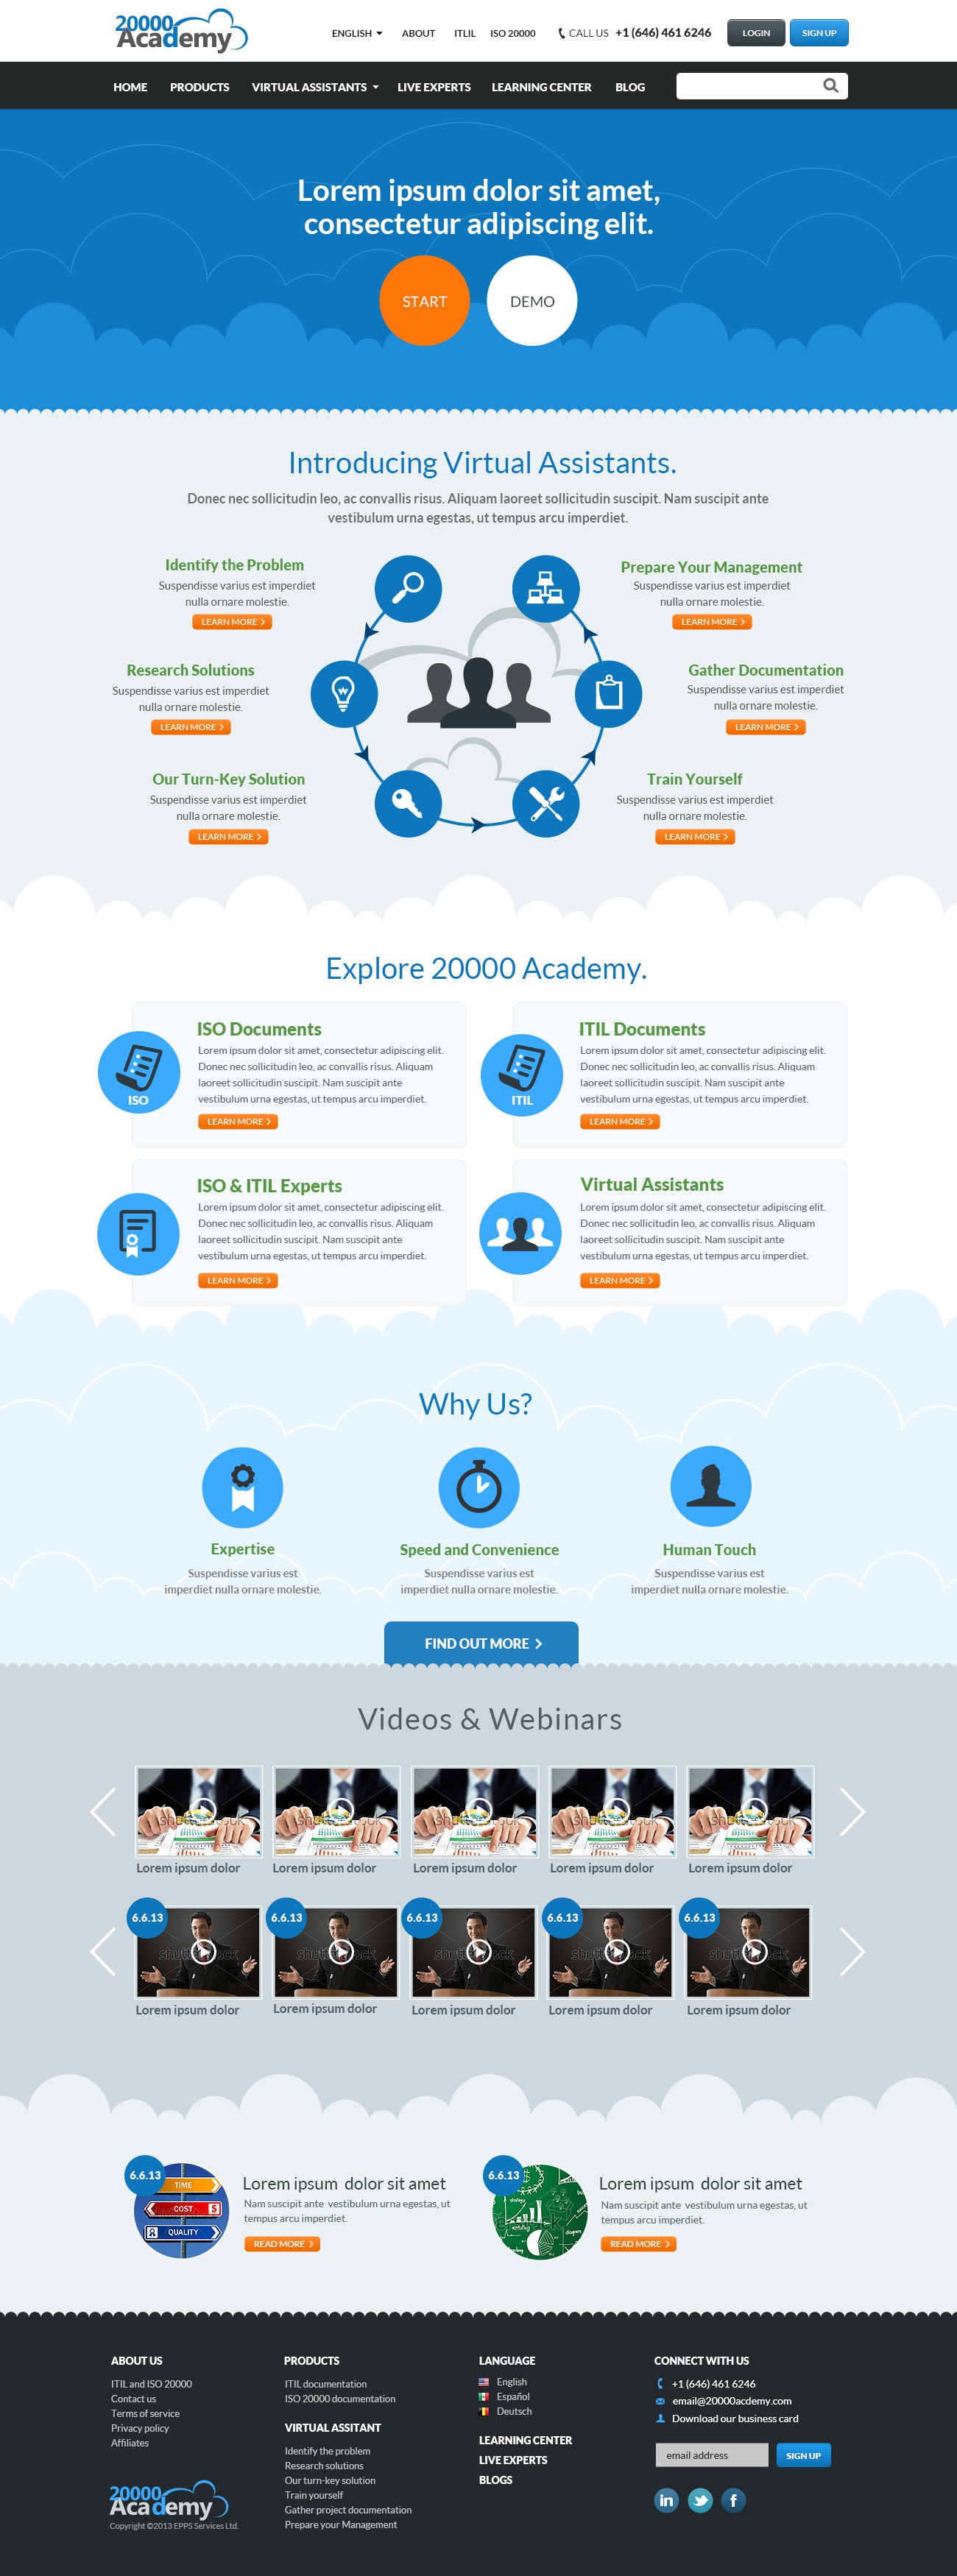 GUARANTEED: 20000Academy needs a cutting edge and fresh website design